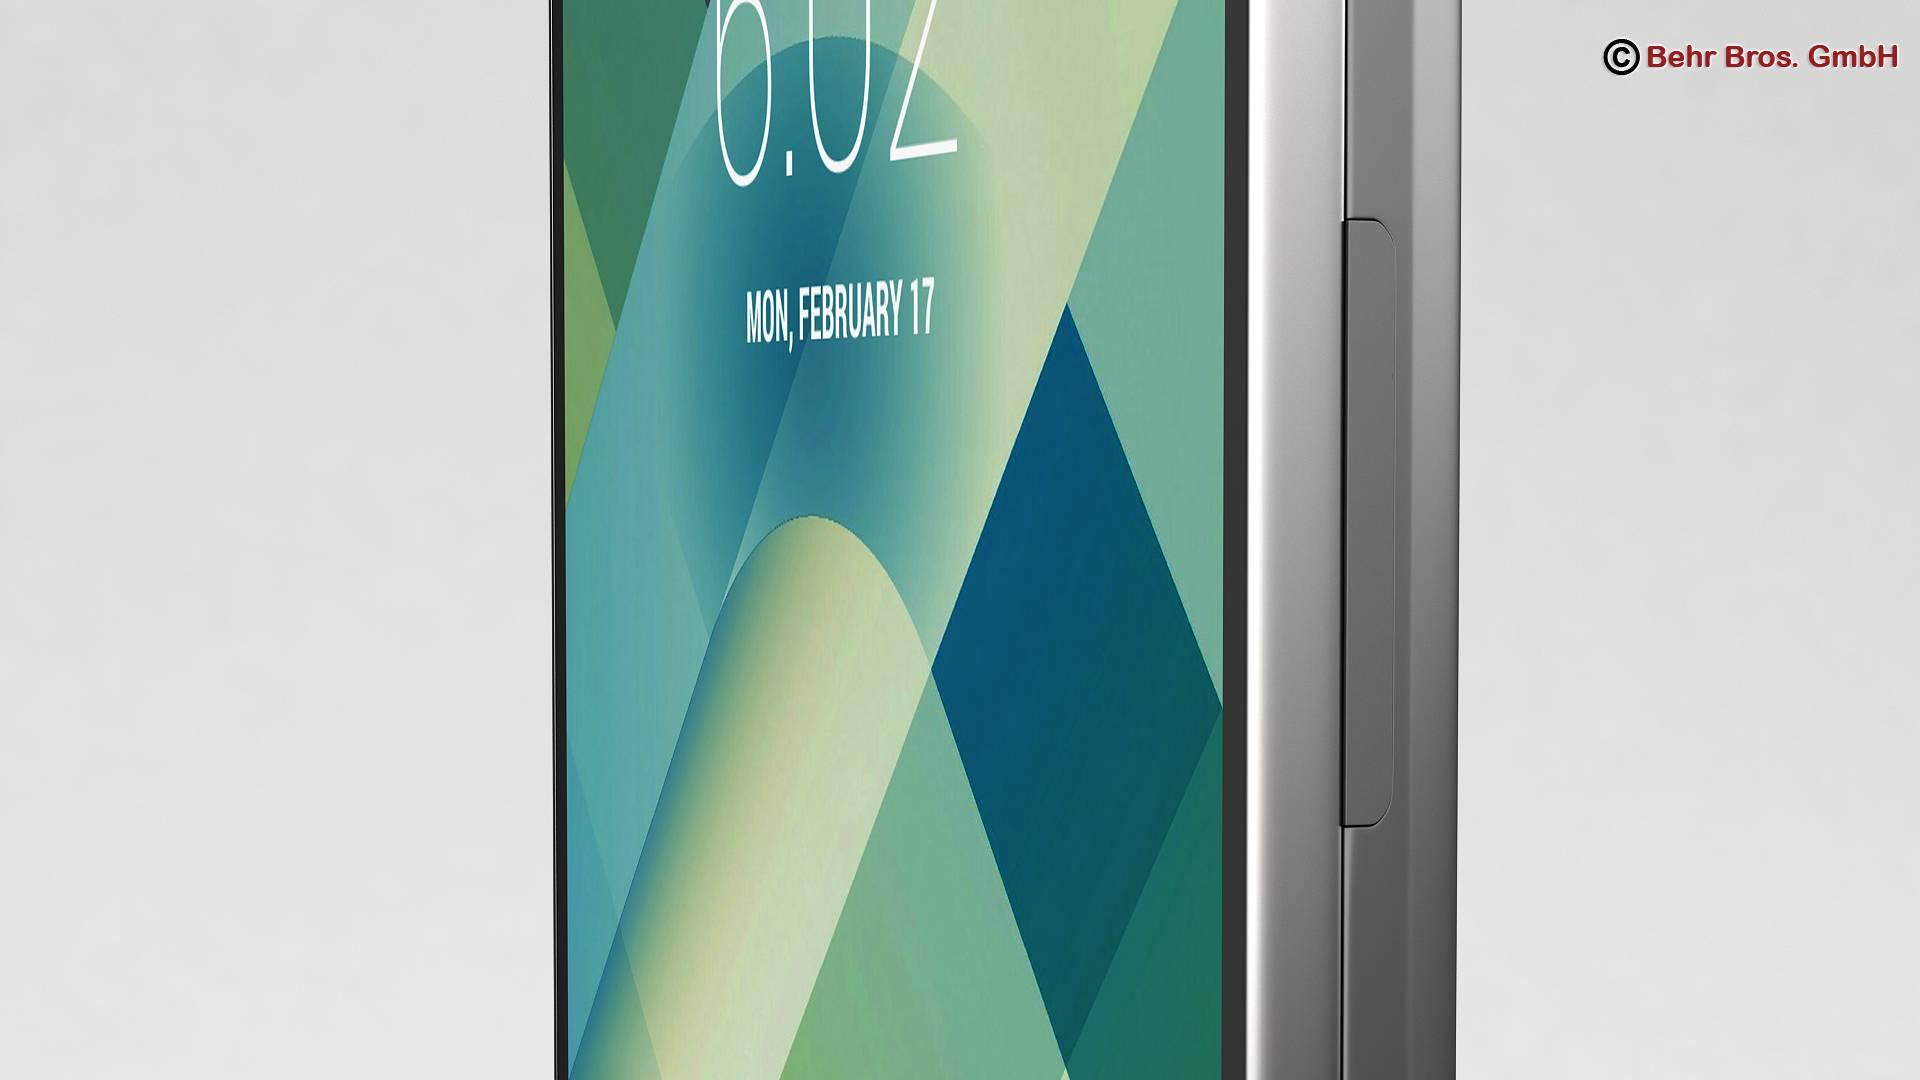 generic smartphone 6 inch 3d model 3ds max fbx c4d lwo ma mb obj 161662